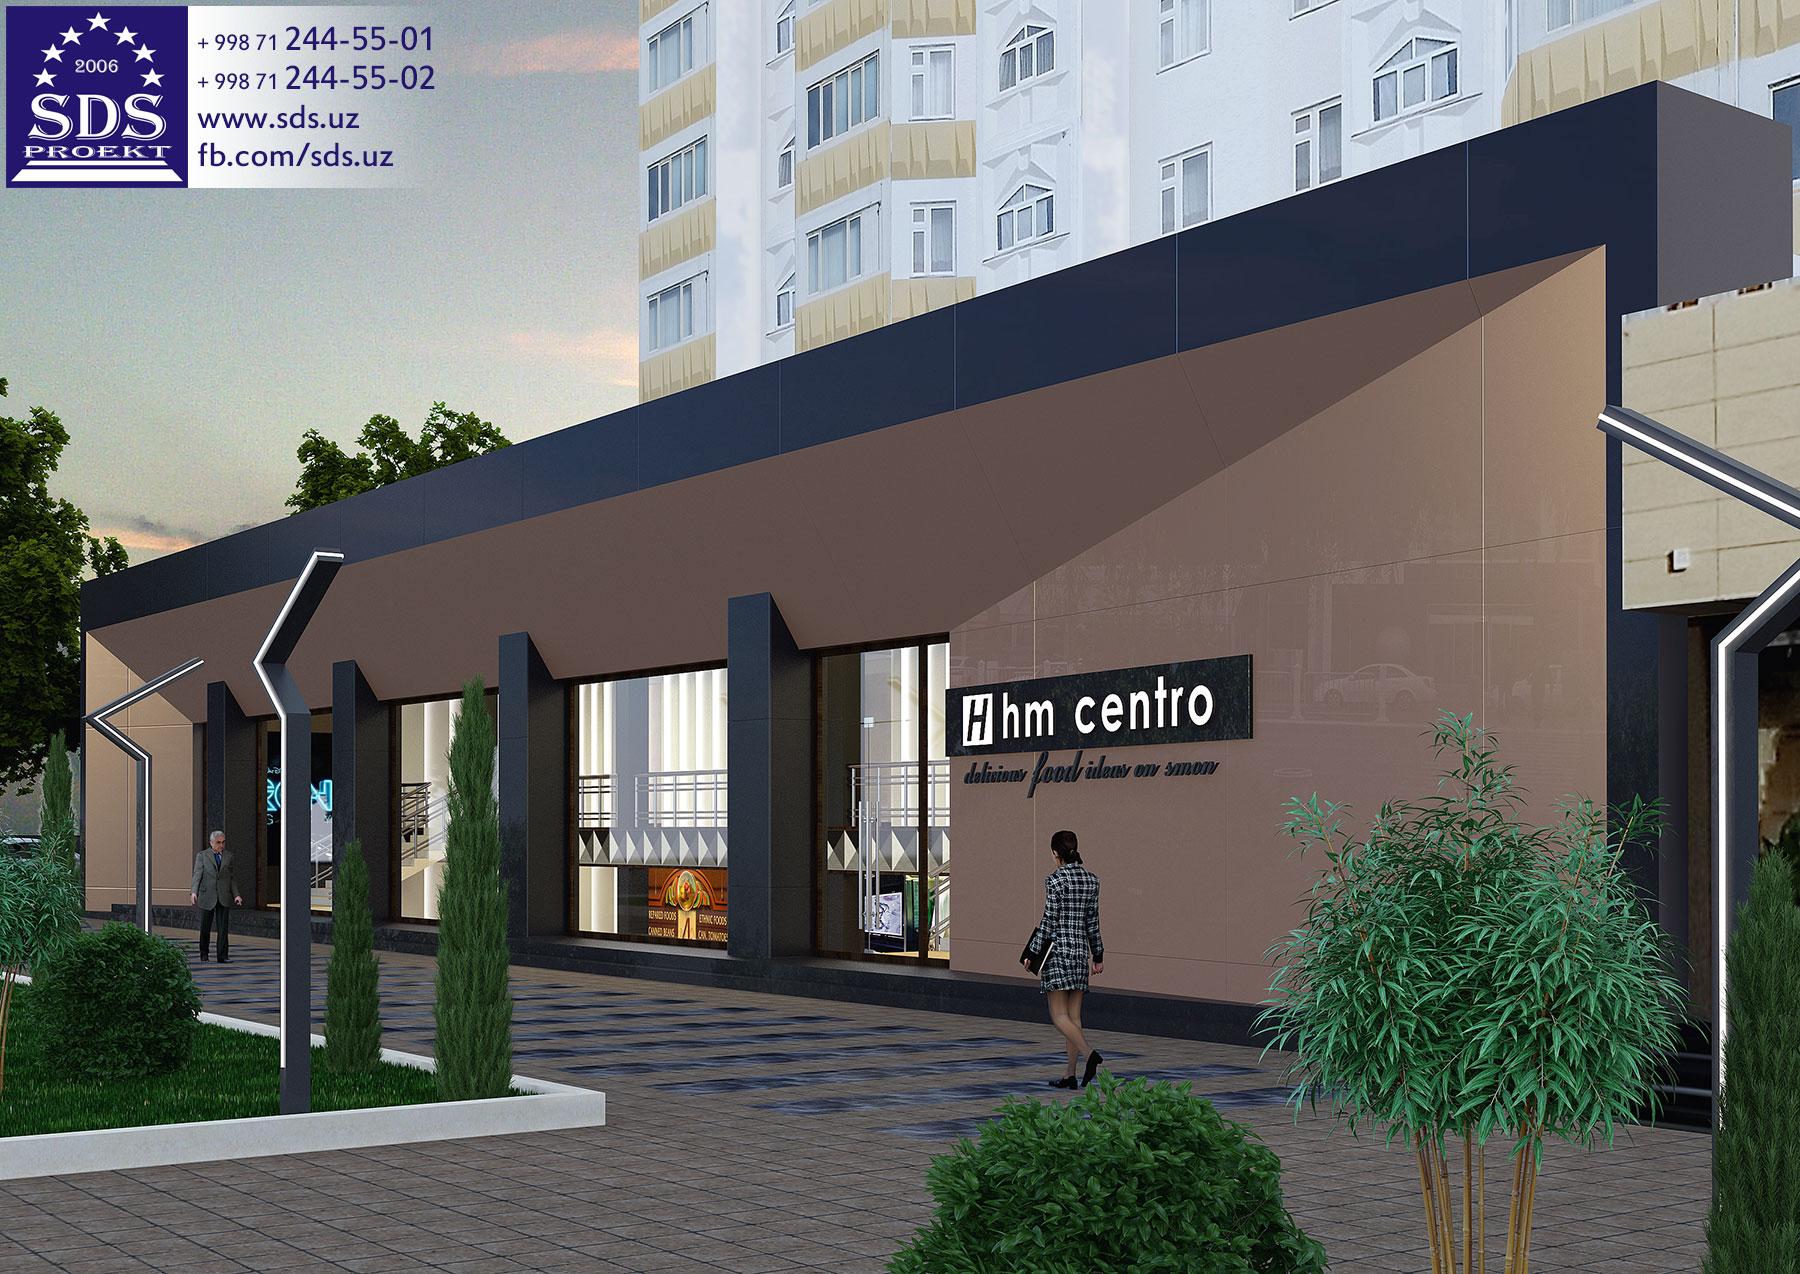 Проект реконструкции магазина на улице А.Тимура